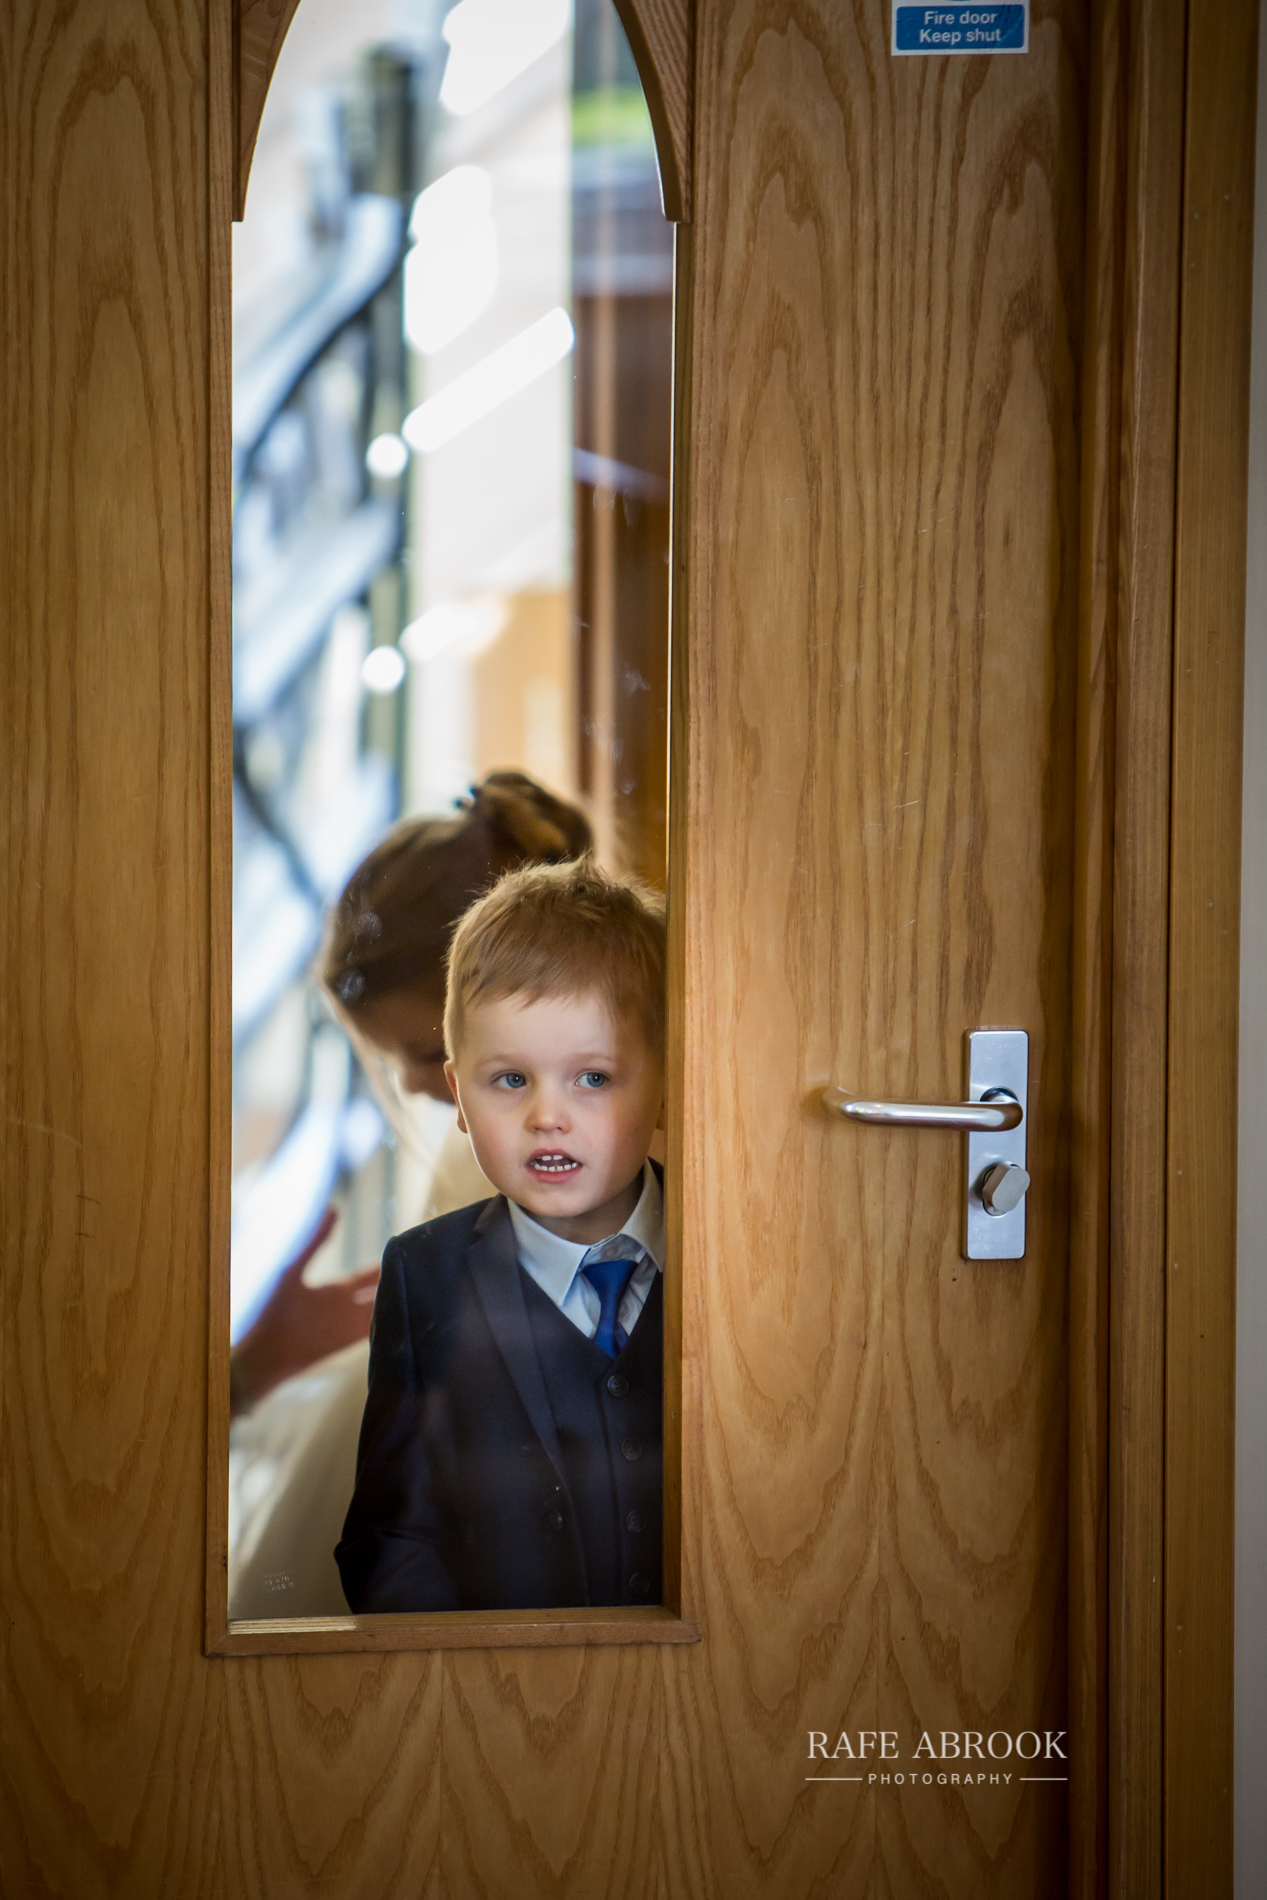 agnes & laurence wedding kings lodge hotel kings langley hertfordshire-1088.jpg